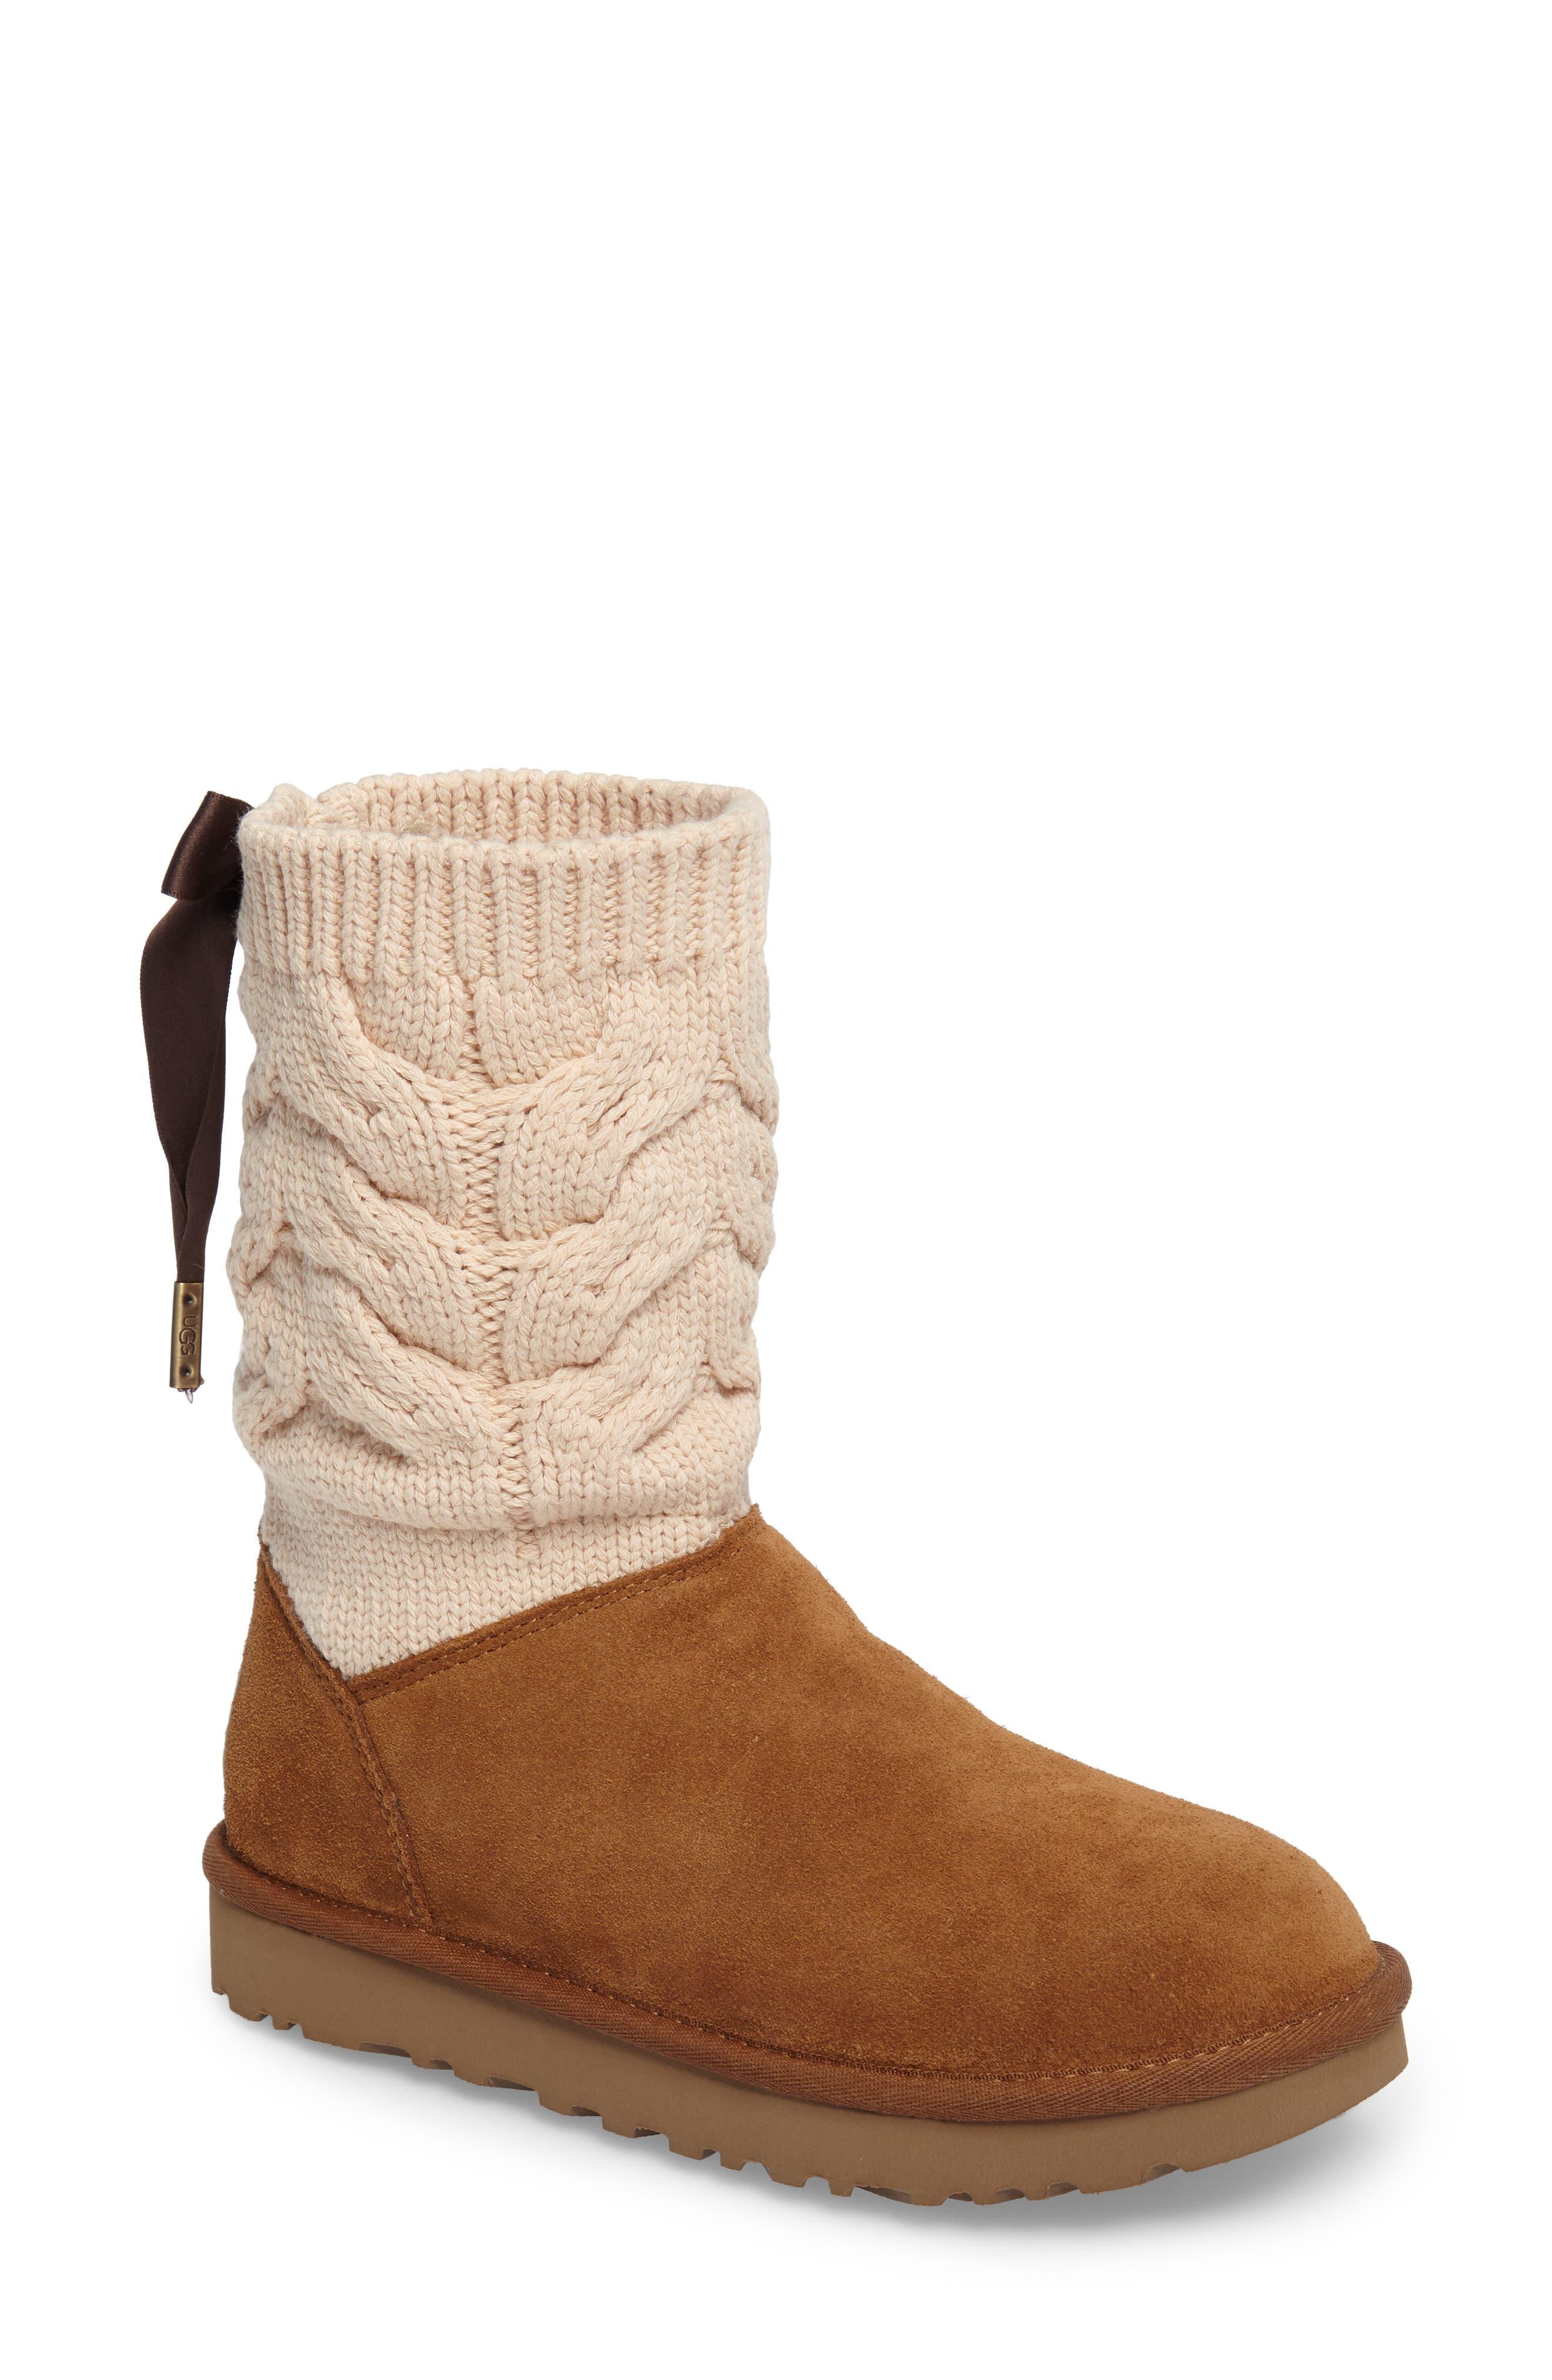 Kiandra Boot,                         Main,                         color, Chestnut Suede